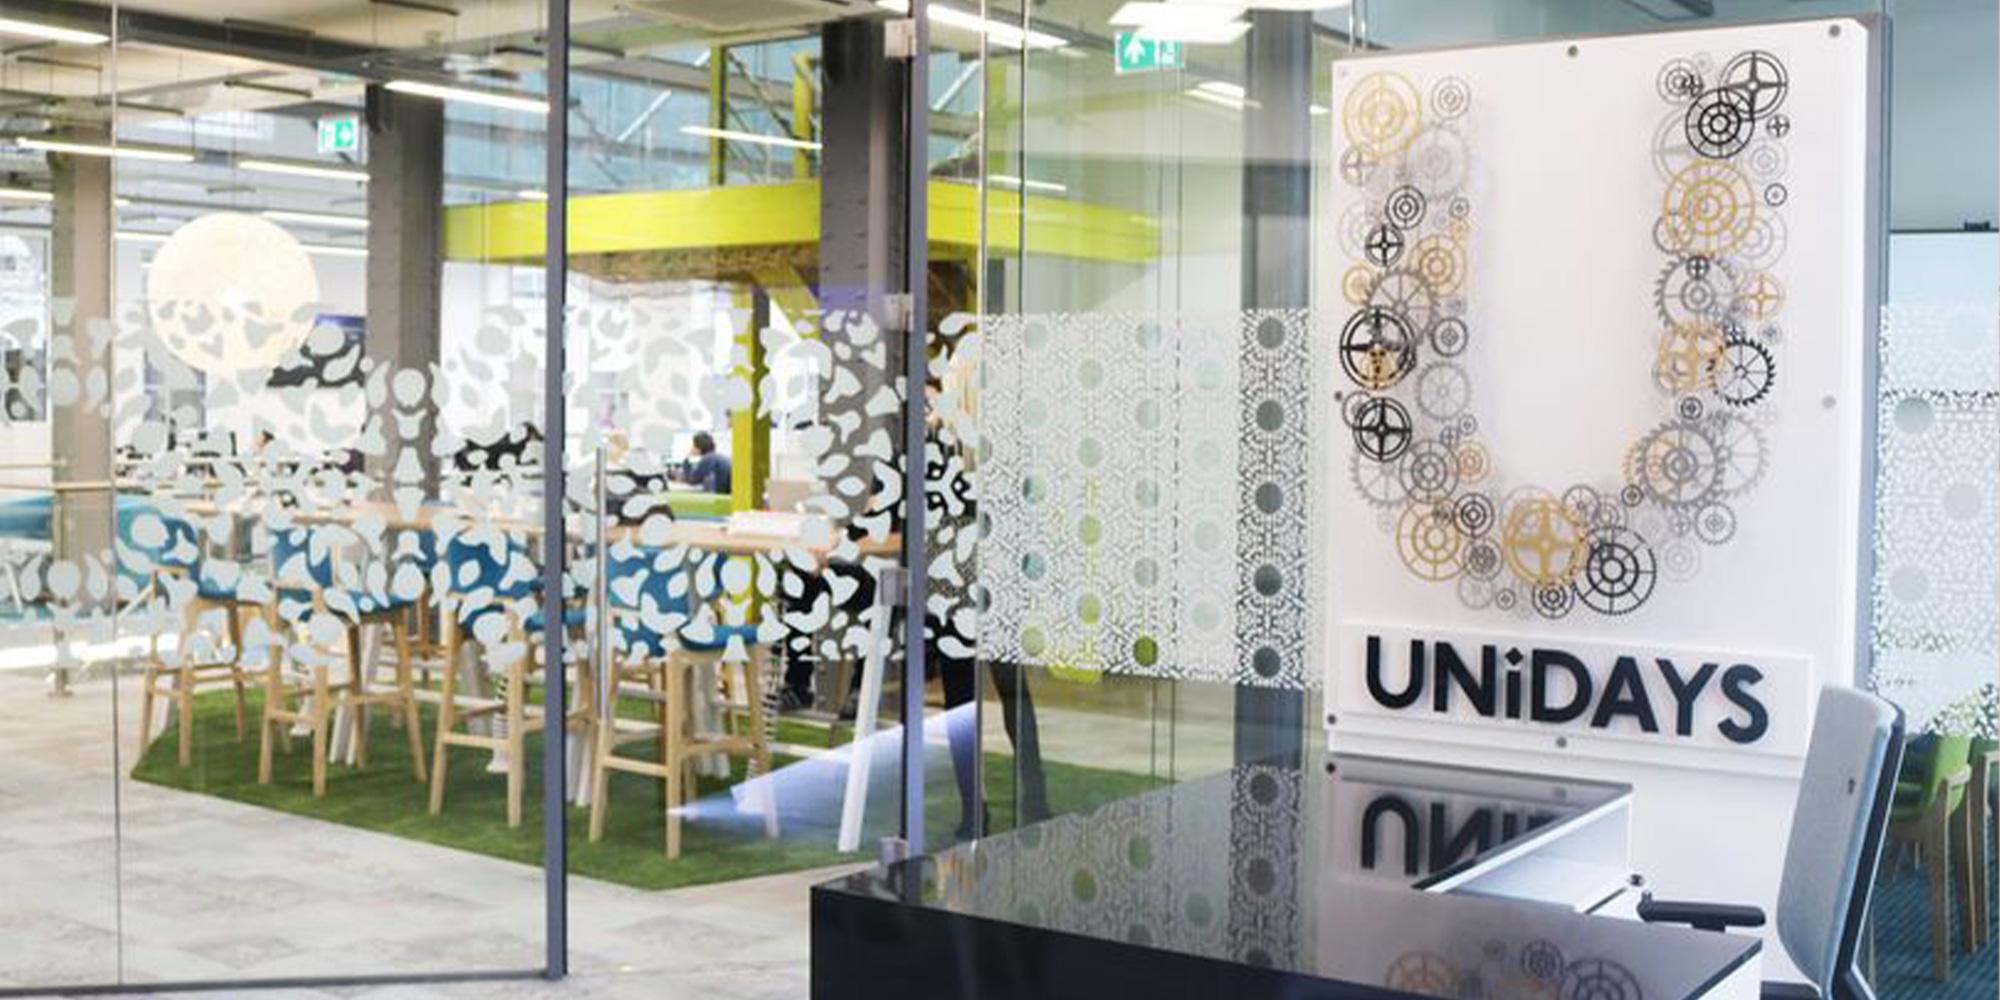 Unidays Case Studies Featured Image